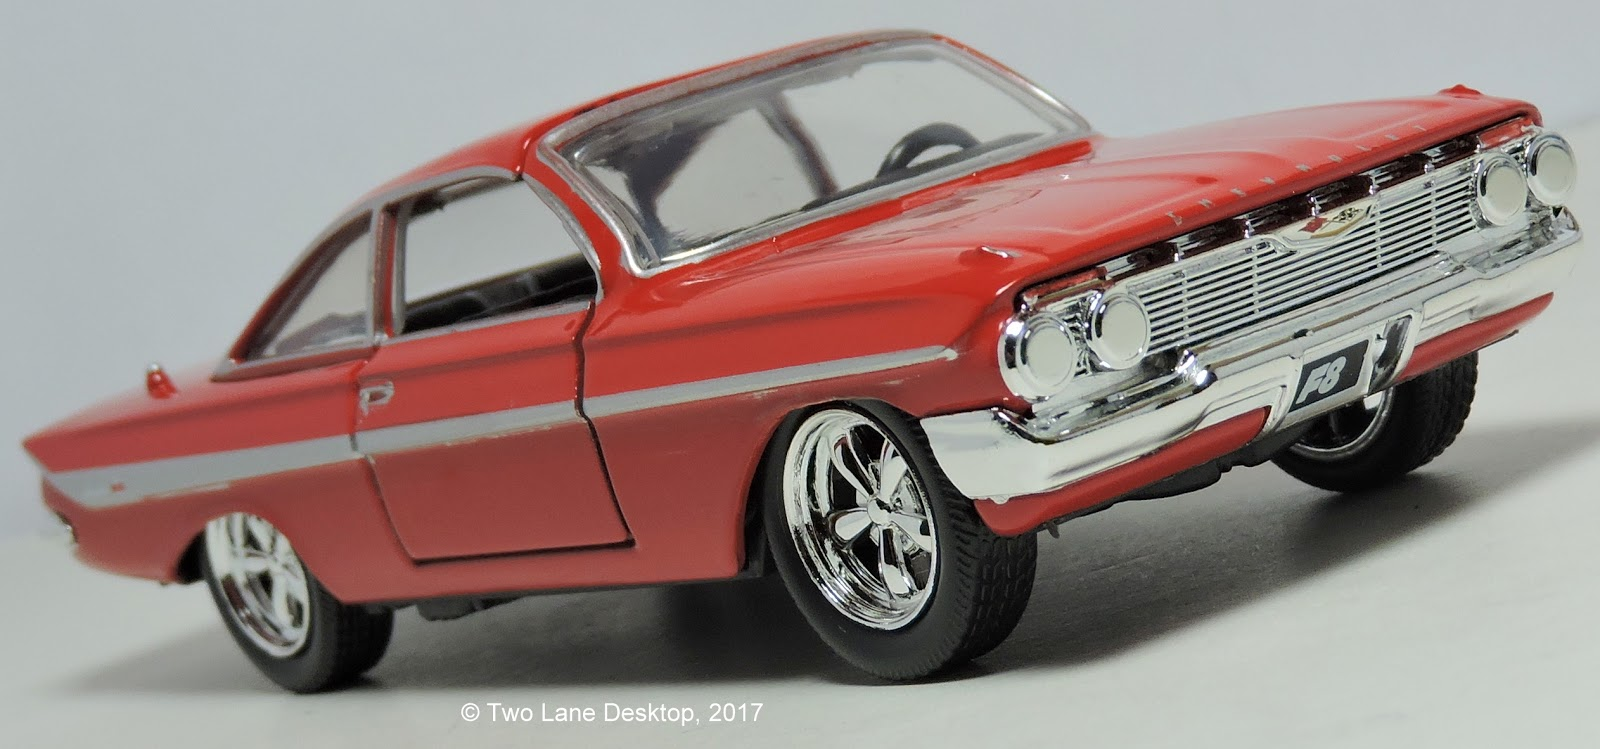 Two lane desktop jada toys 1 32 and hot wheels 1 64 1961 chevrolet impala